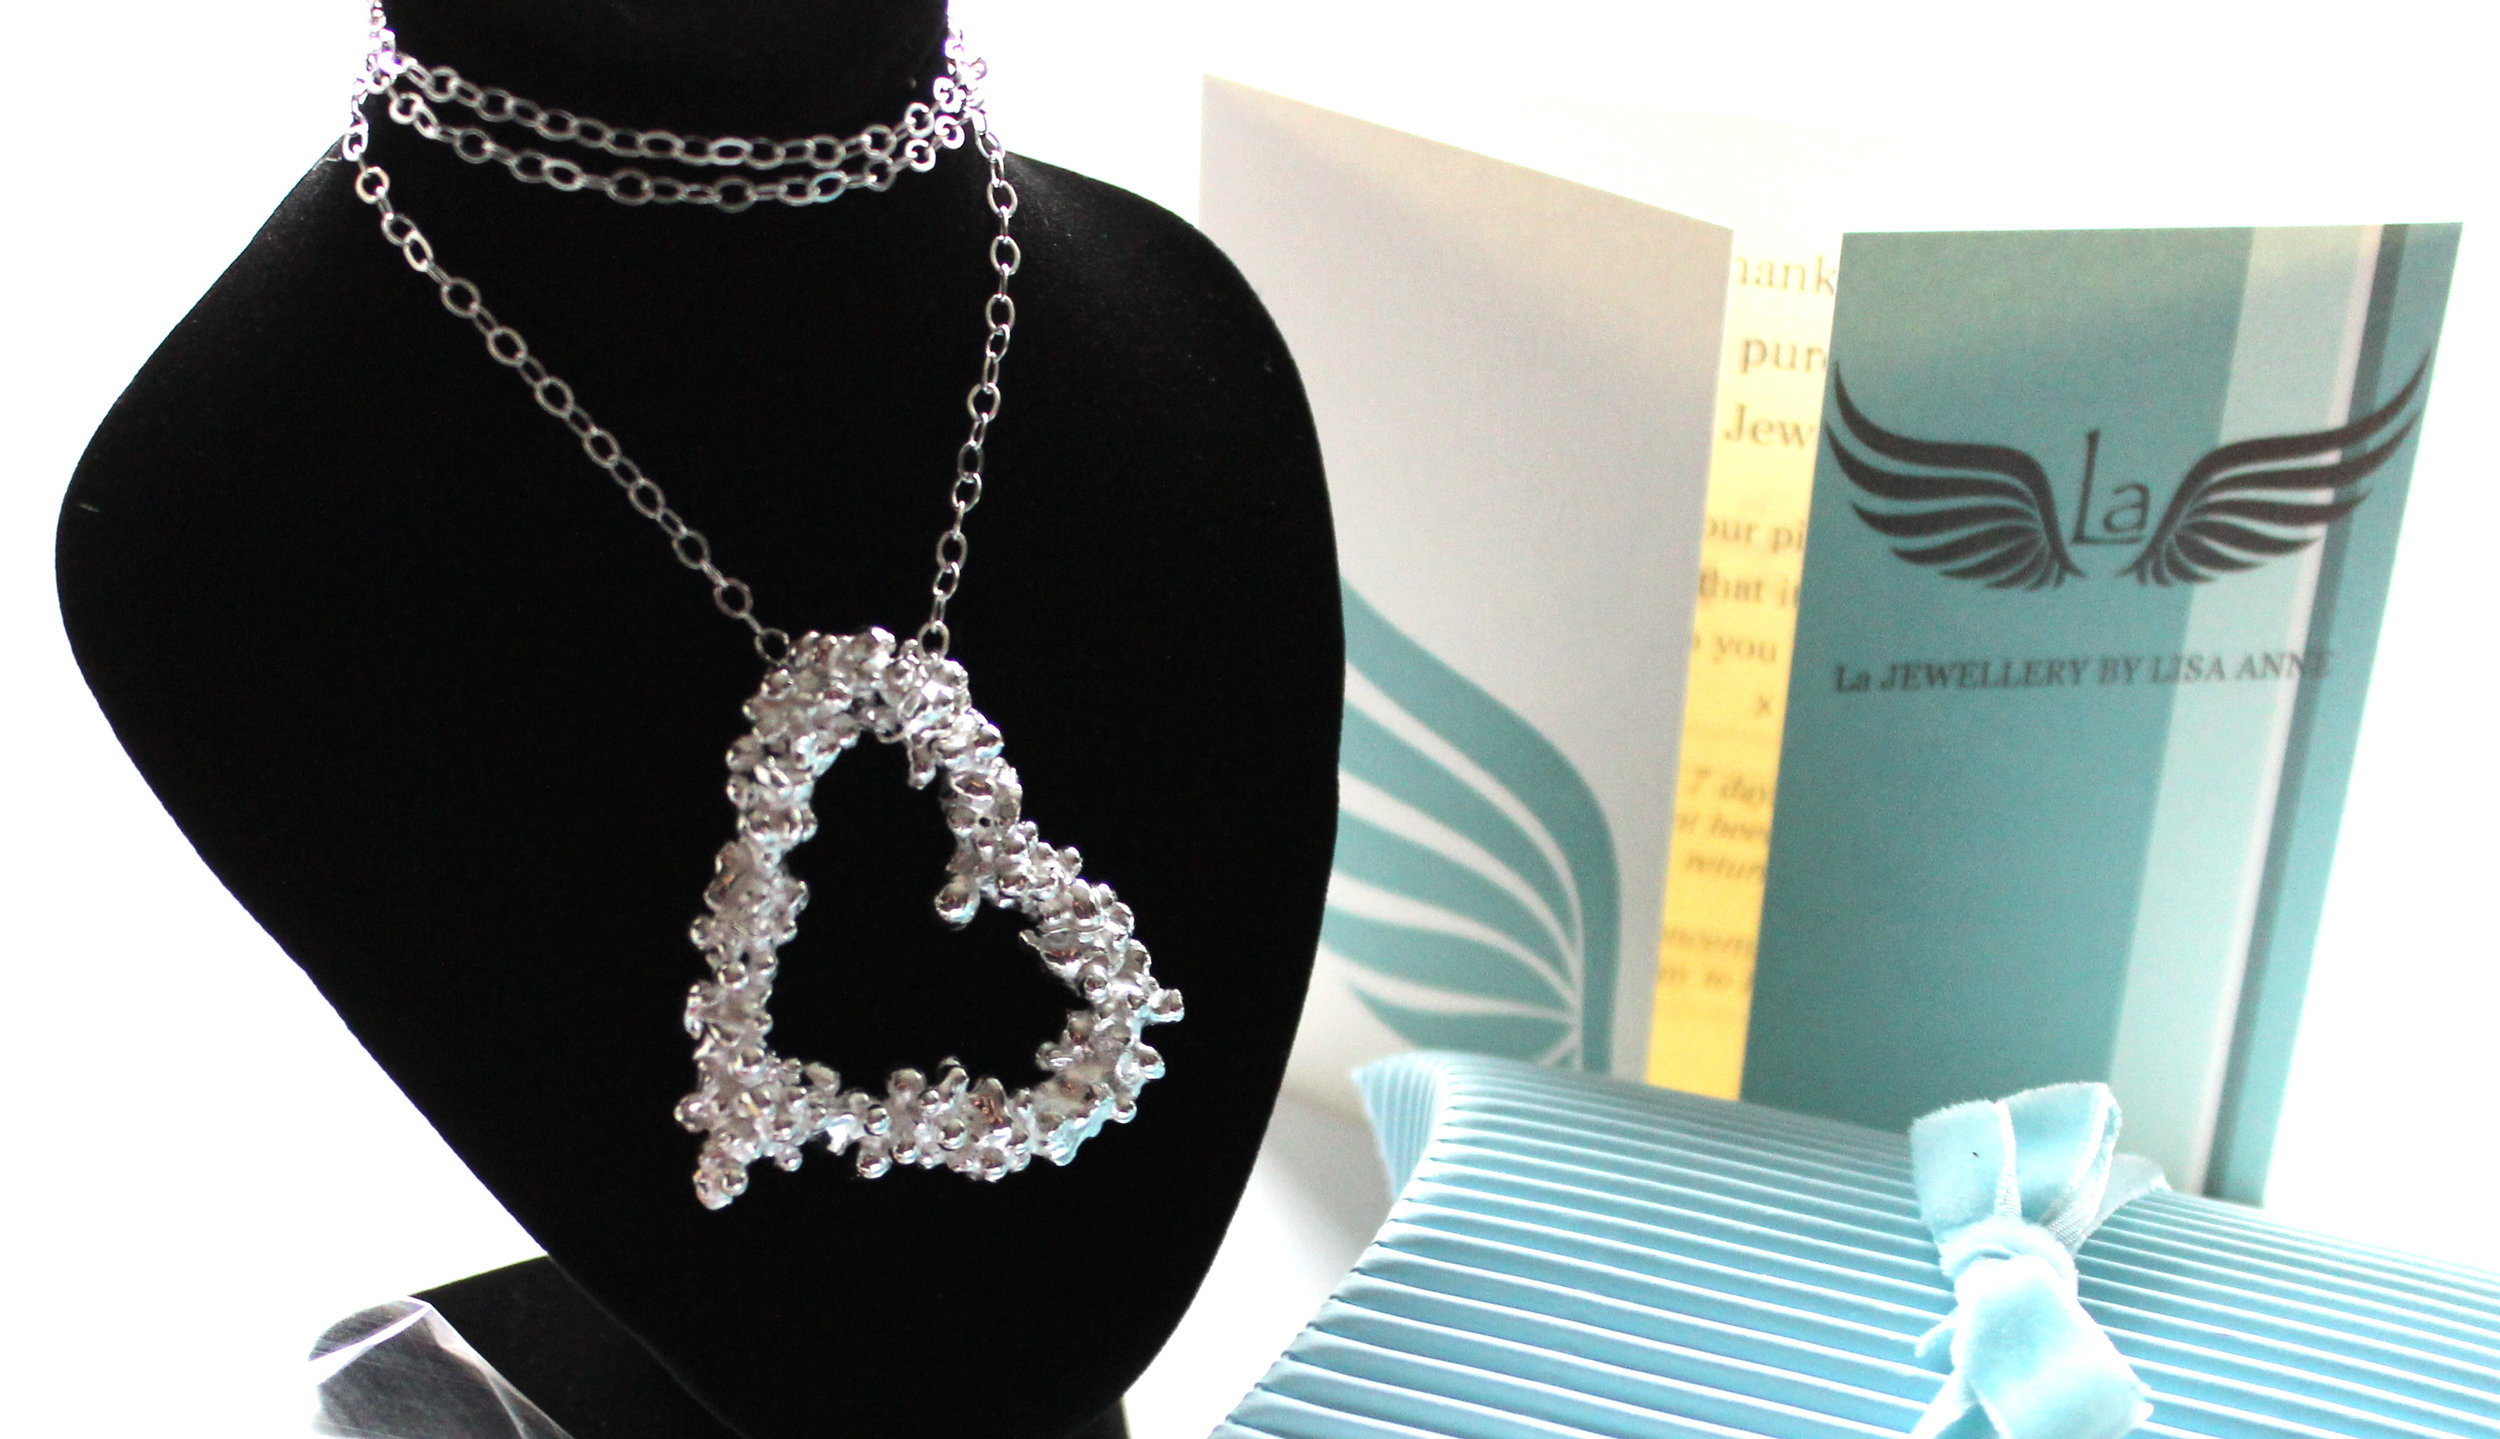 Large Fair Trade Heart copyright La Jewellery